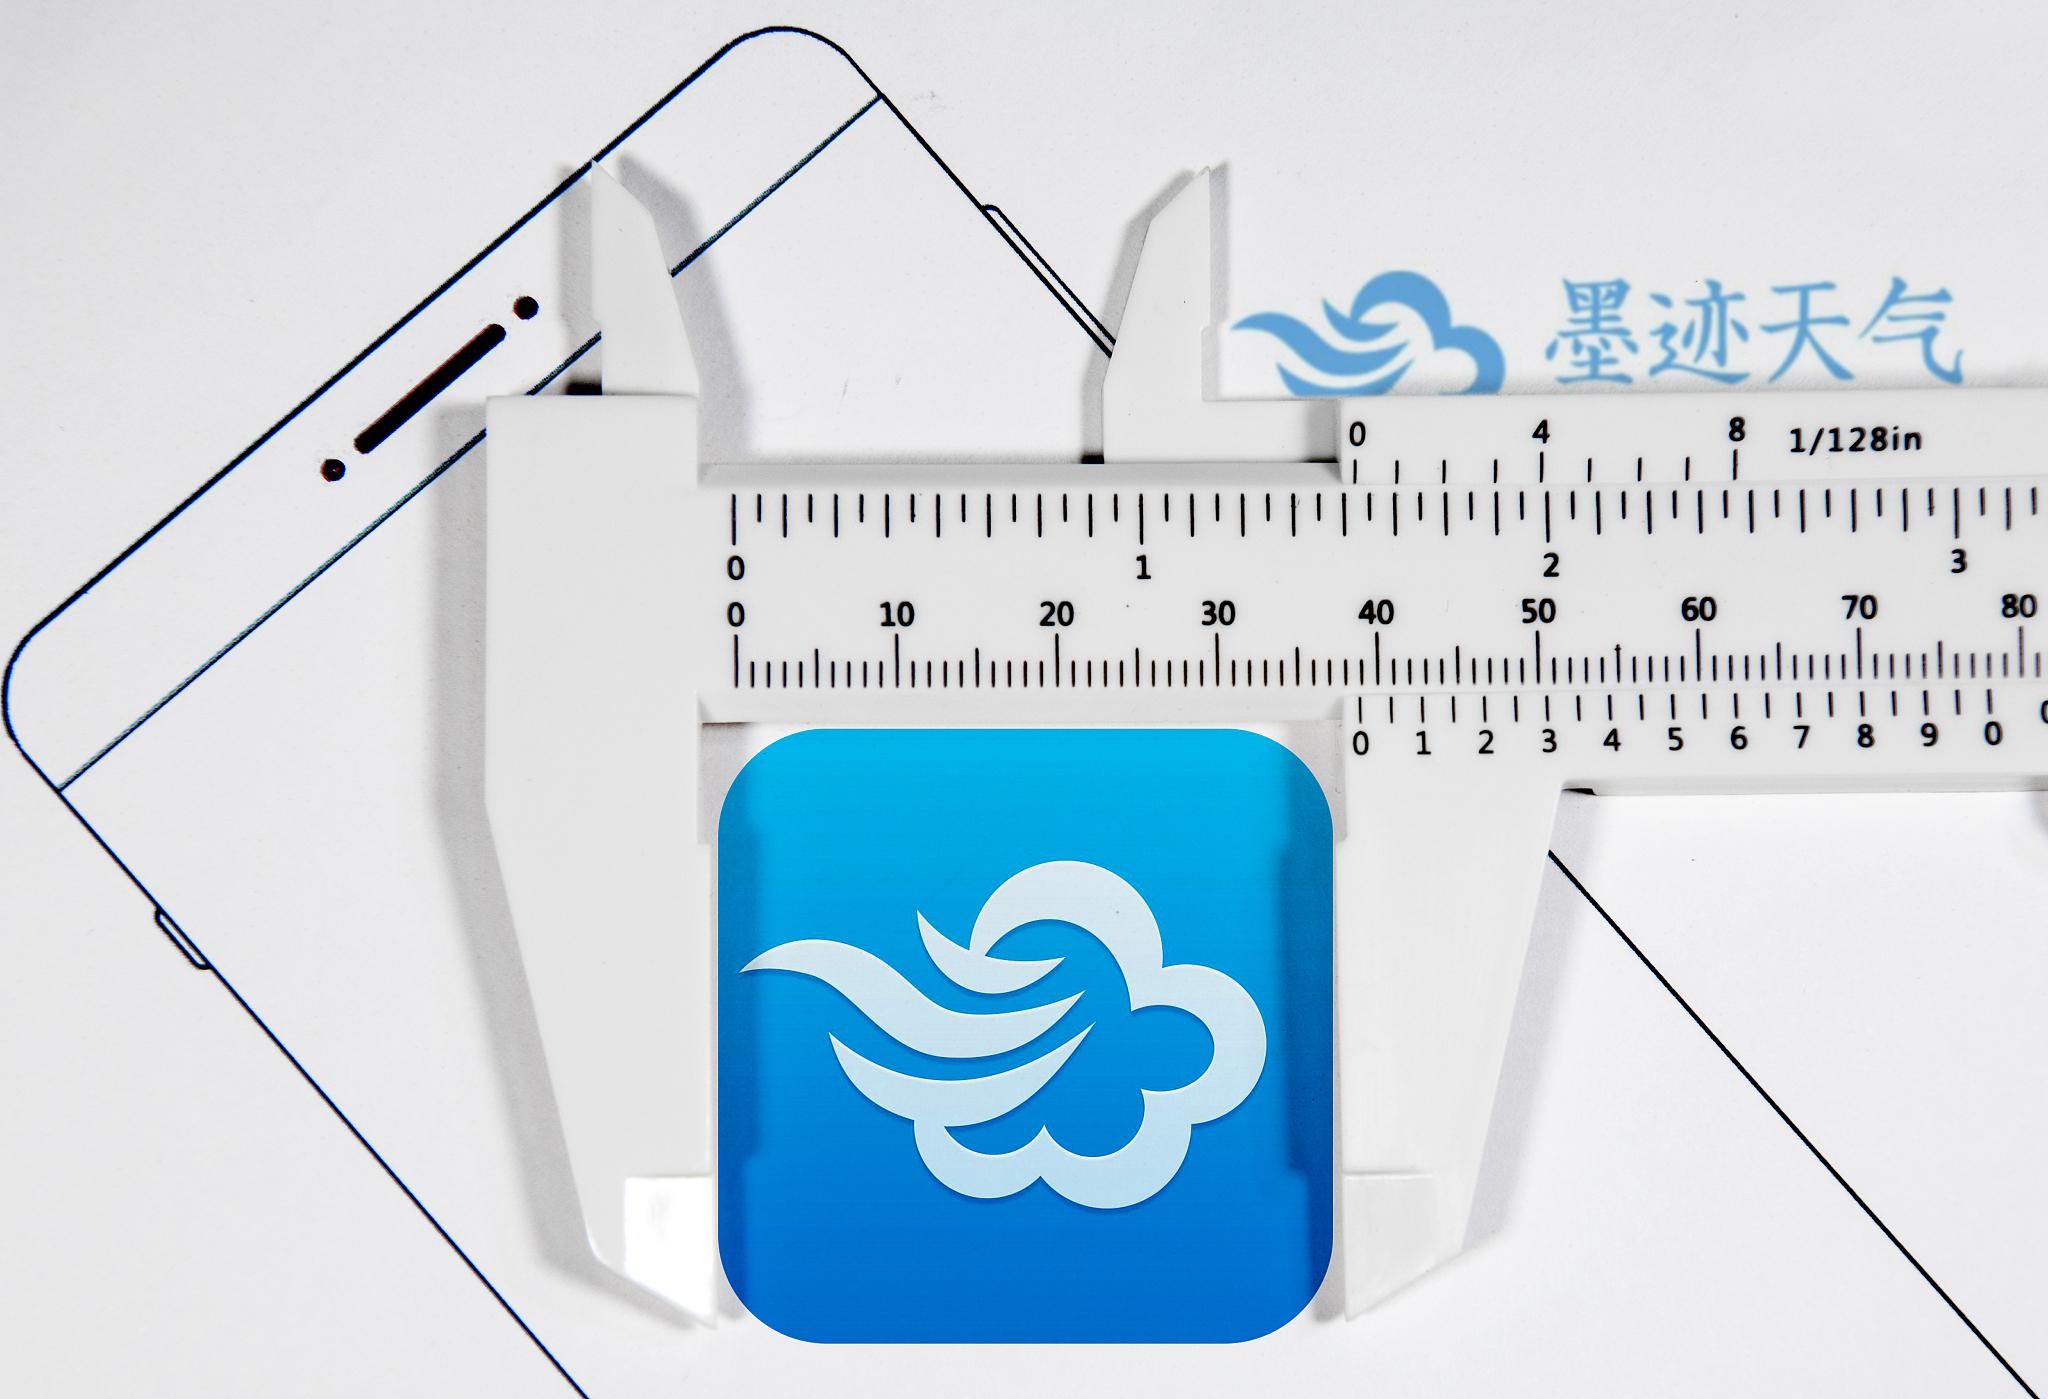 pk拾微信网投哪里找:自动定位天气预报:长沙未来60天天气预报扩展